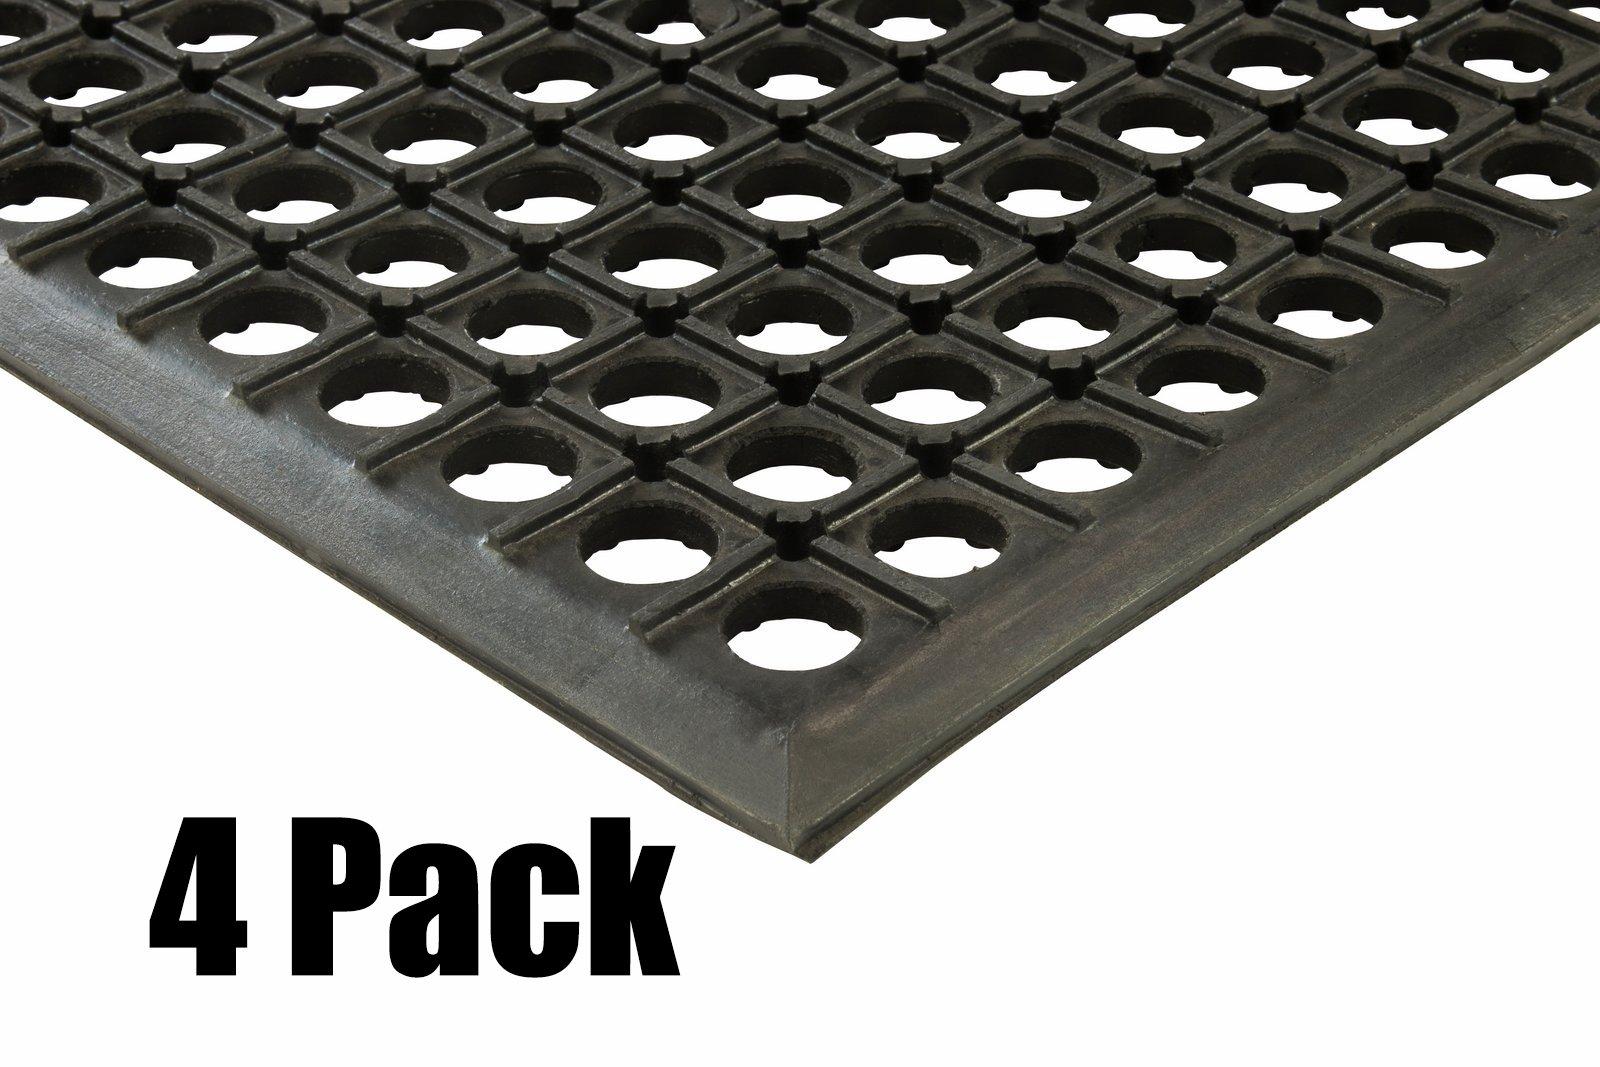 (4) Erie Tools 2x3 Rubber Drainage Floor Mat 24'' x 36'' Anti-Fatigue Anti-slip